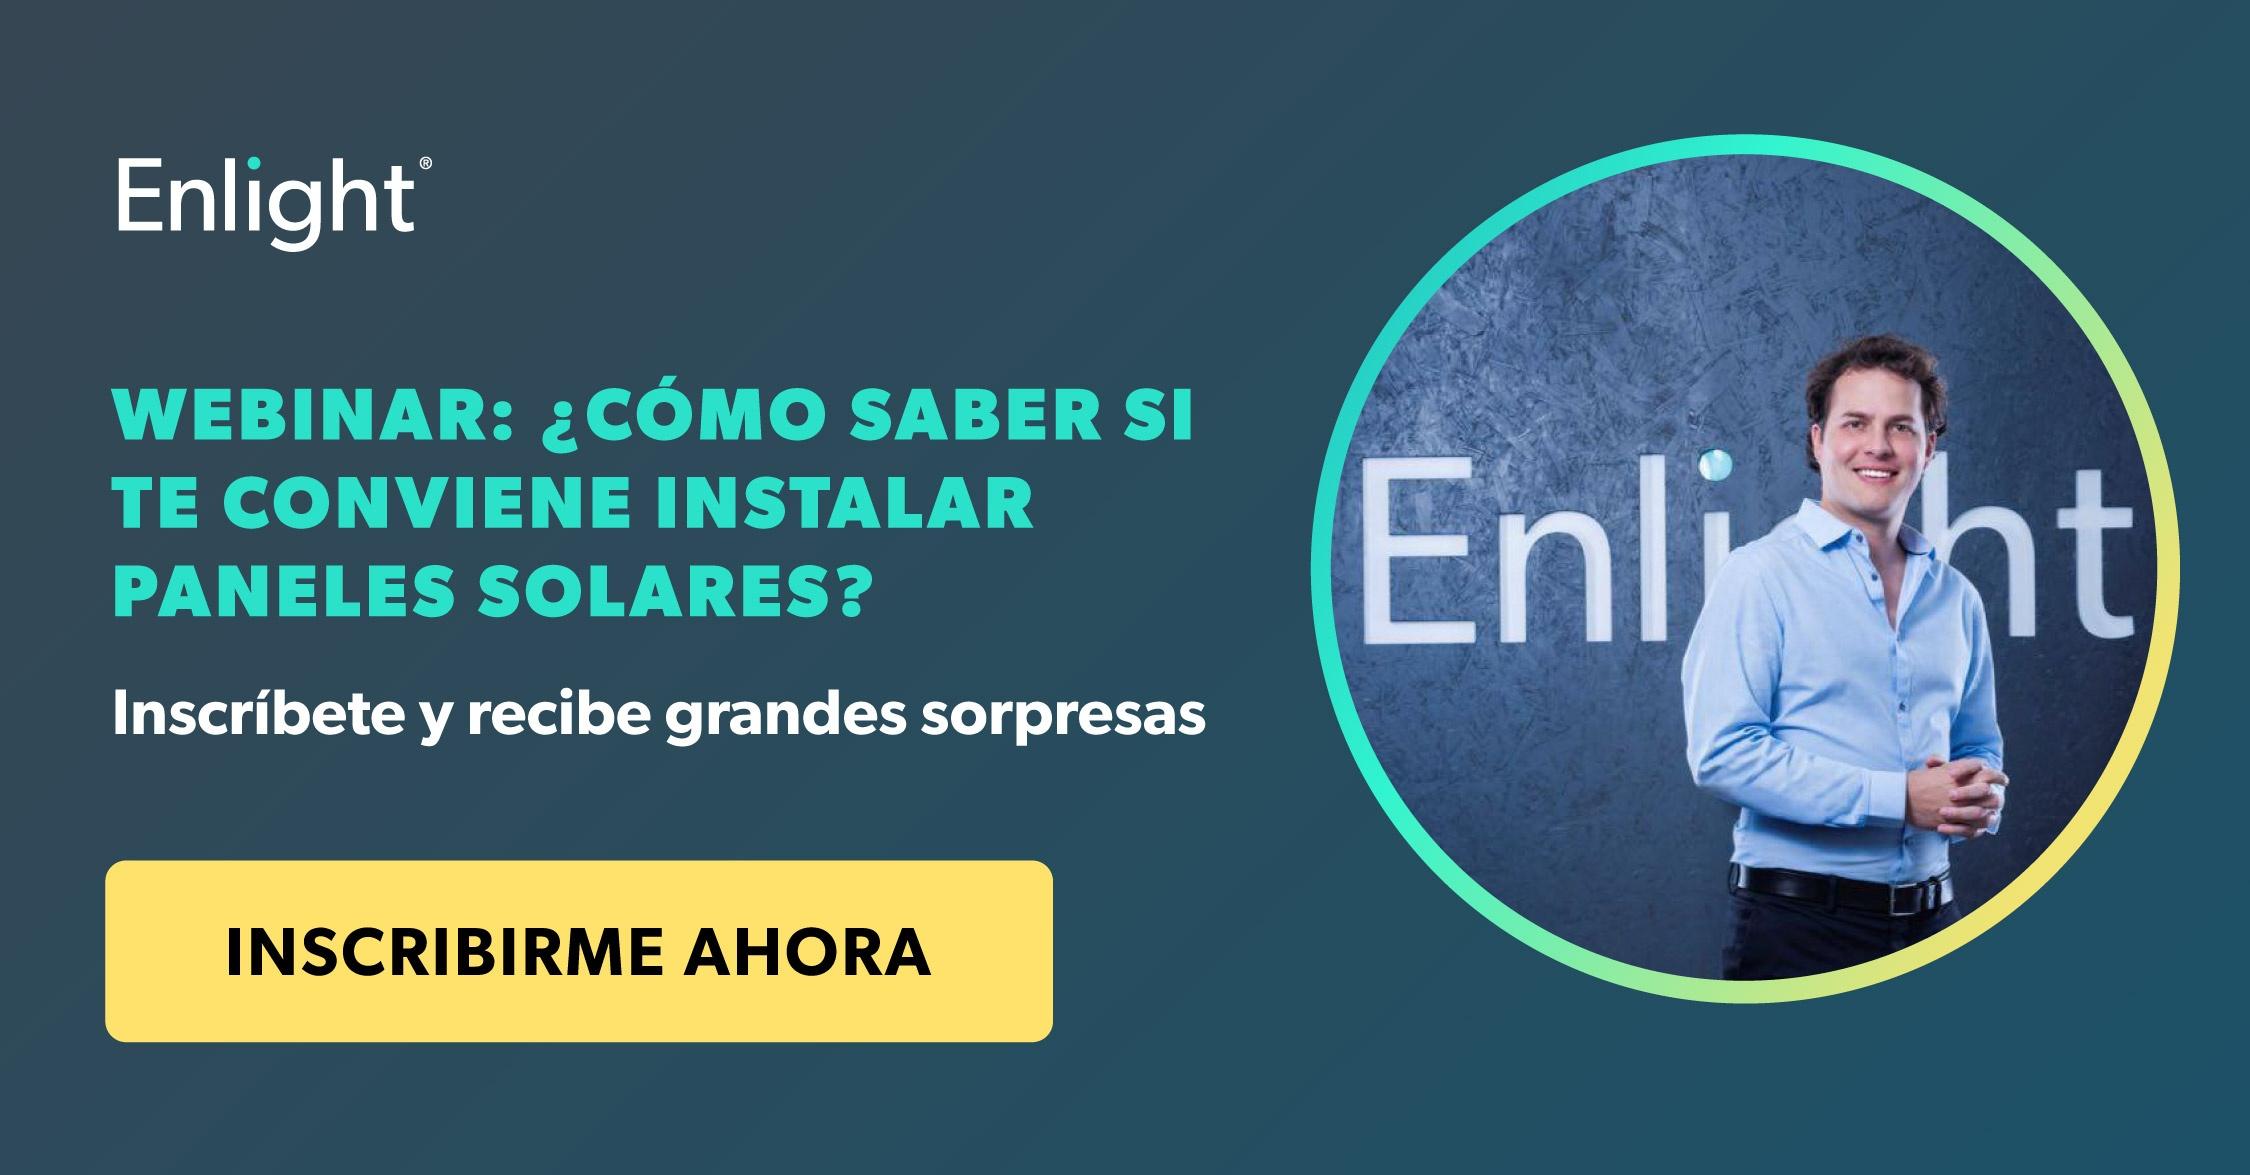 webinar como saber si te convine instalar paneles solares